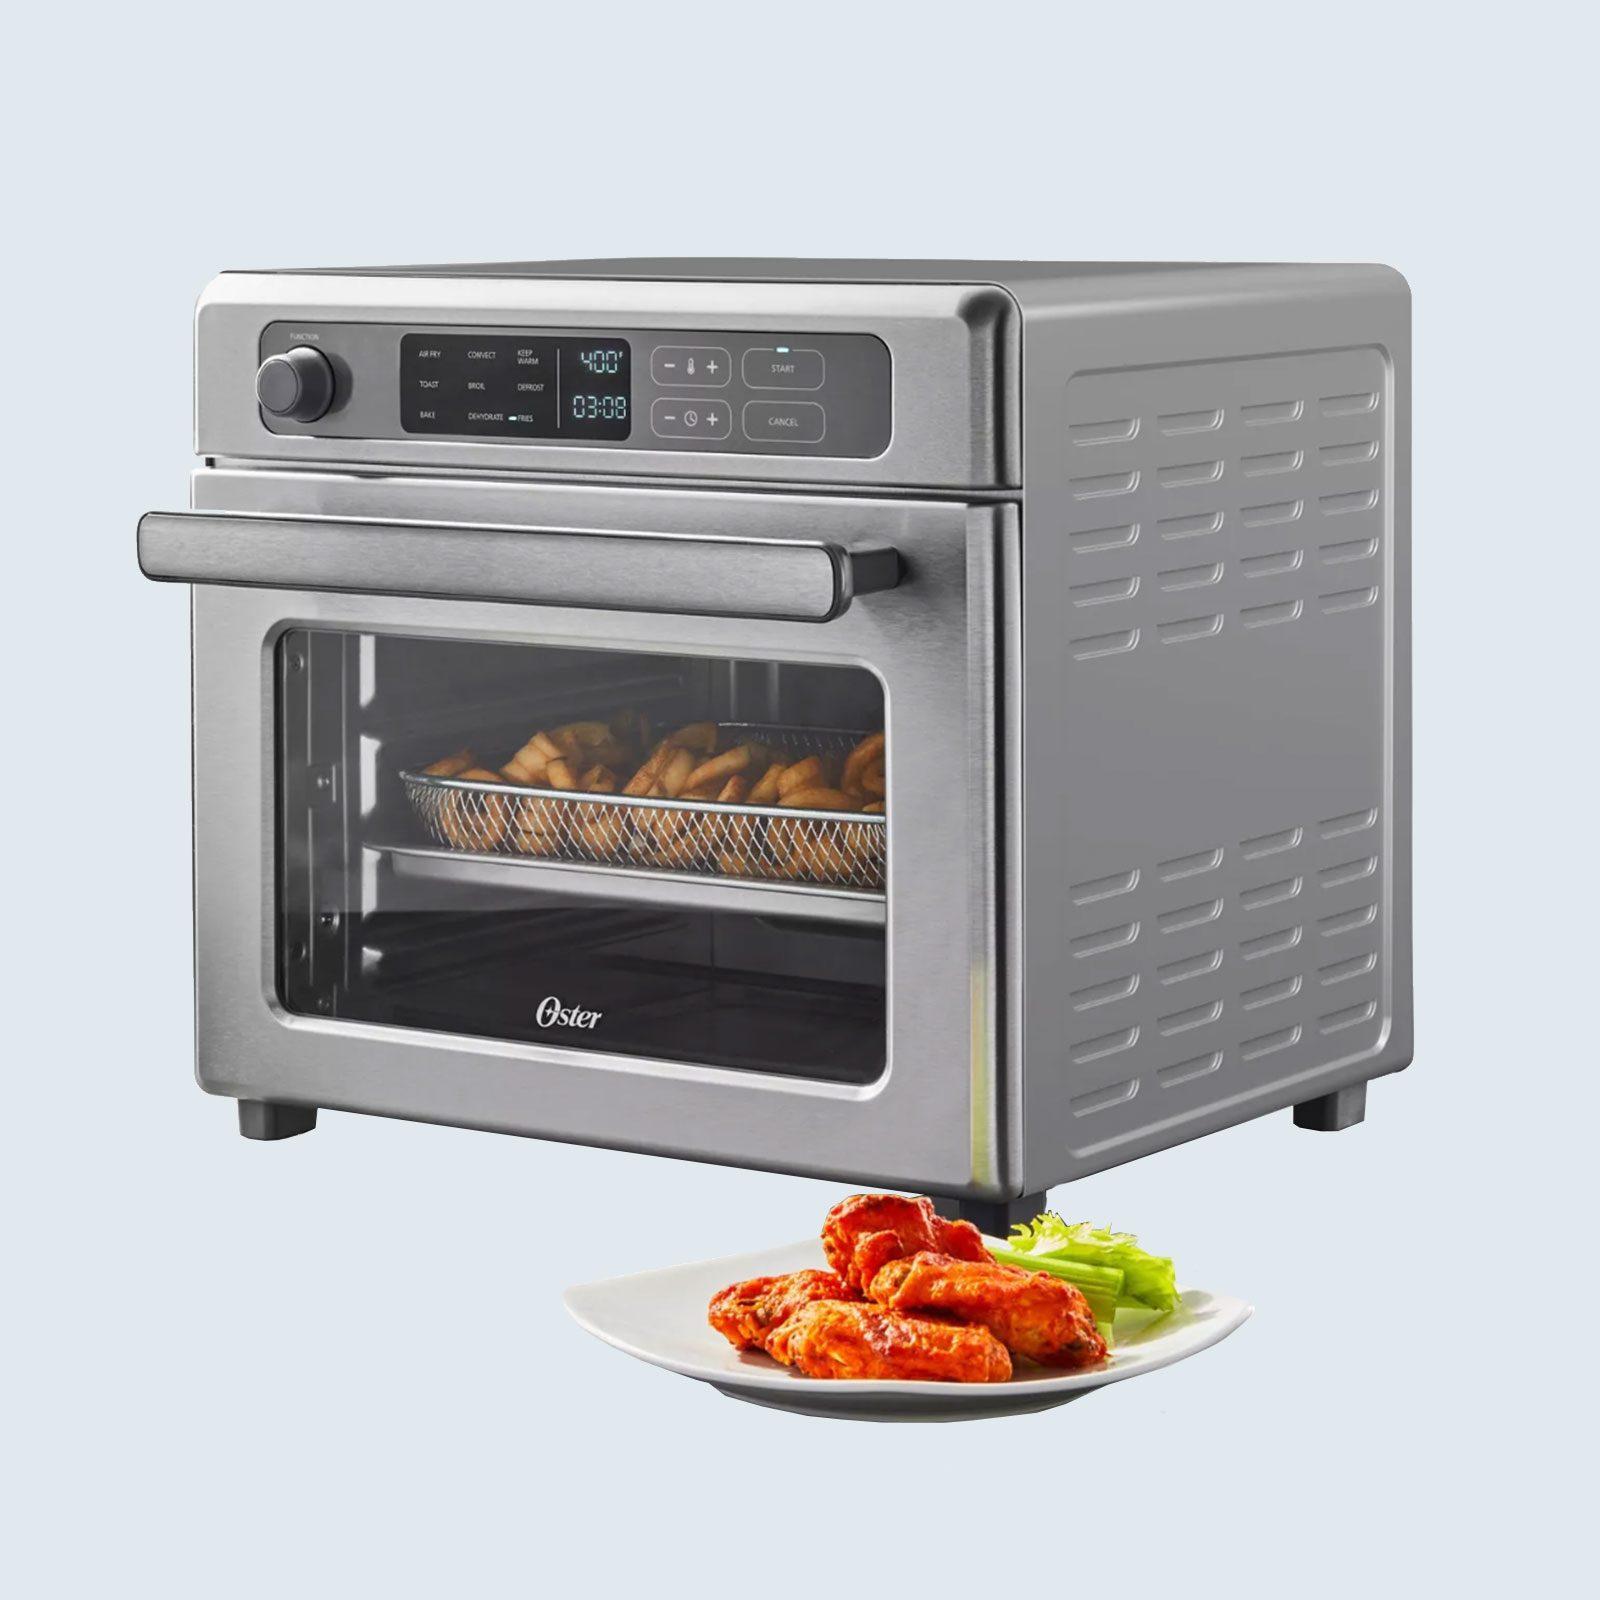 Oster Air Fryer Oven